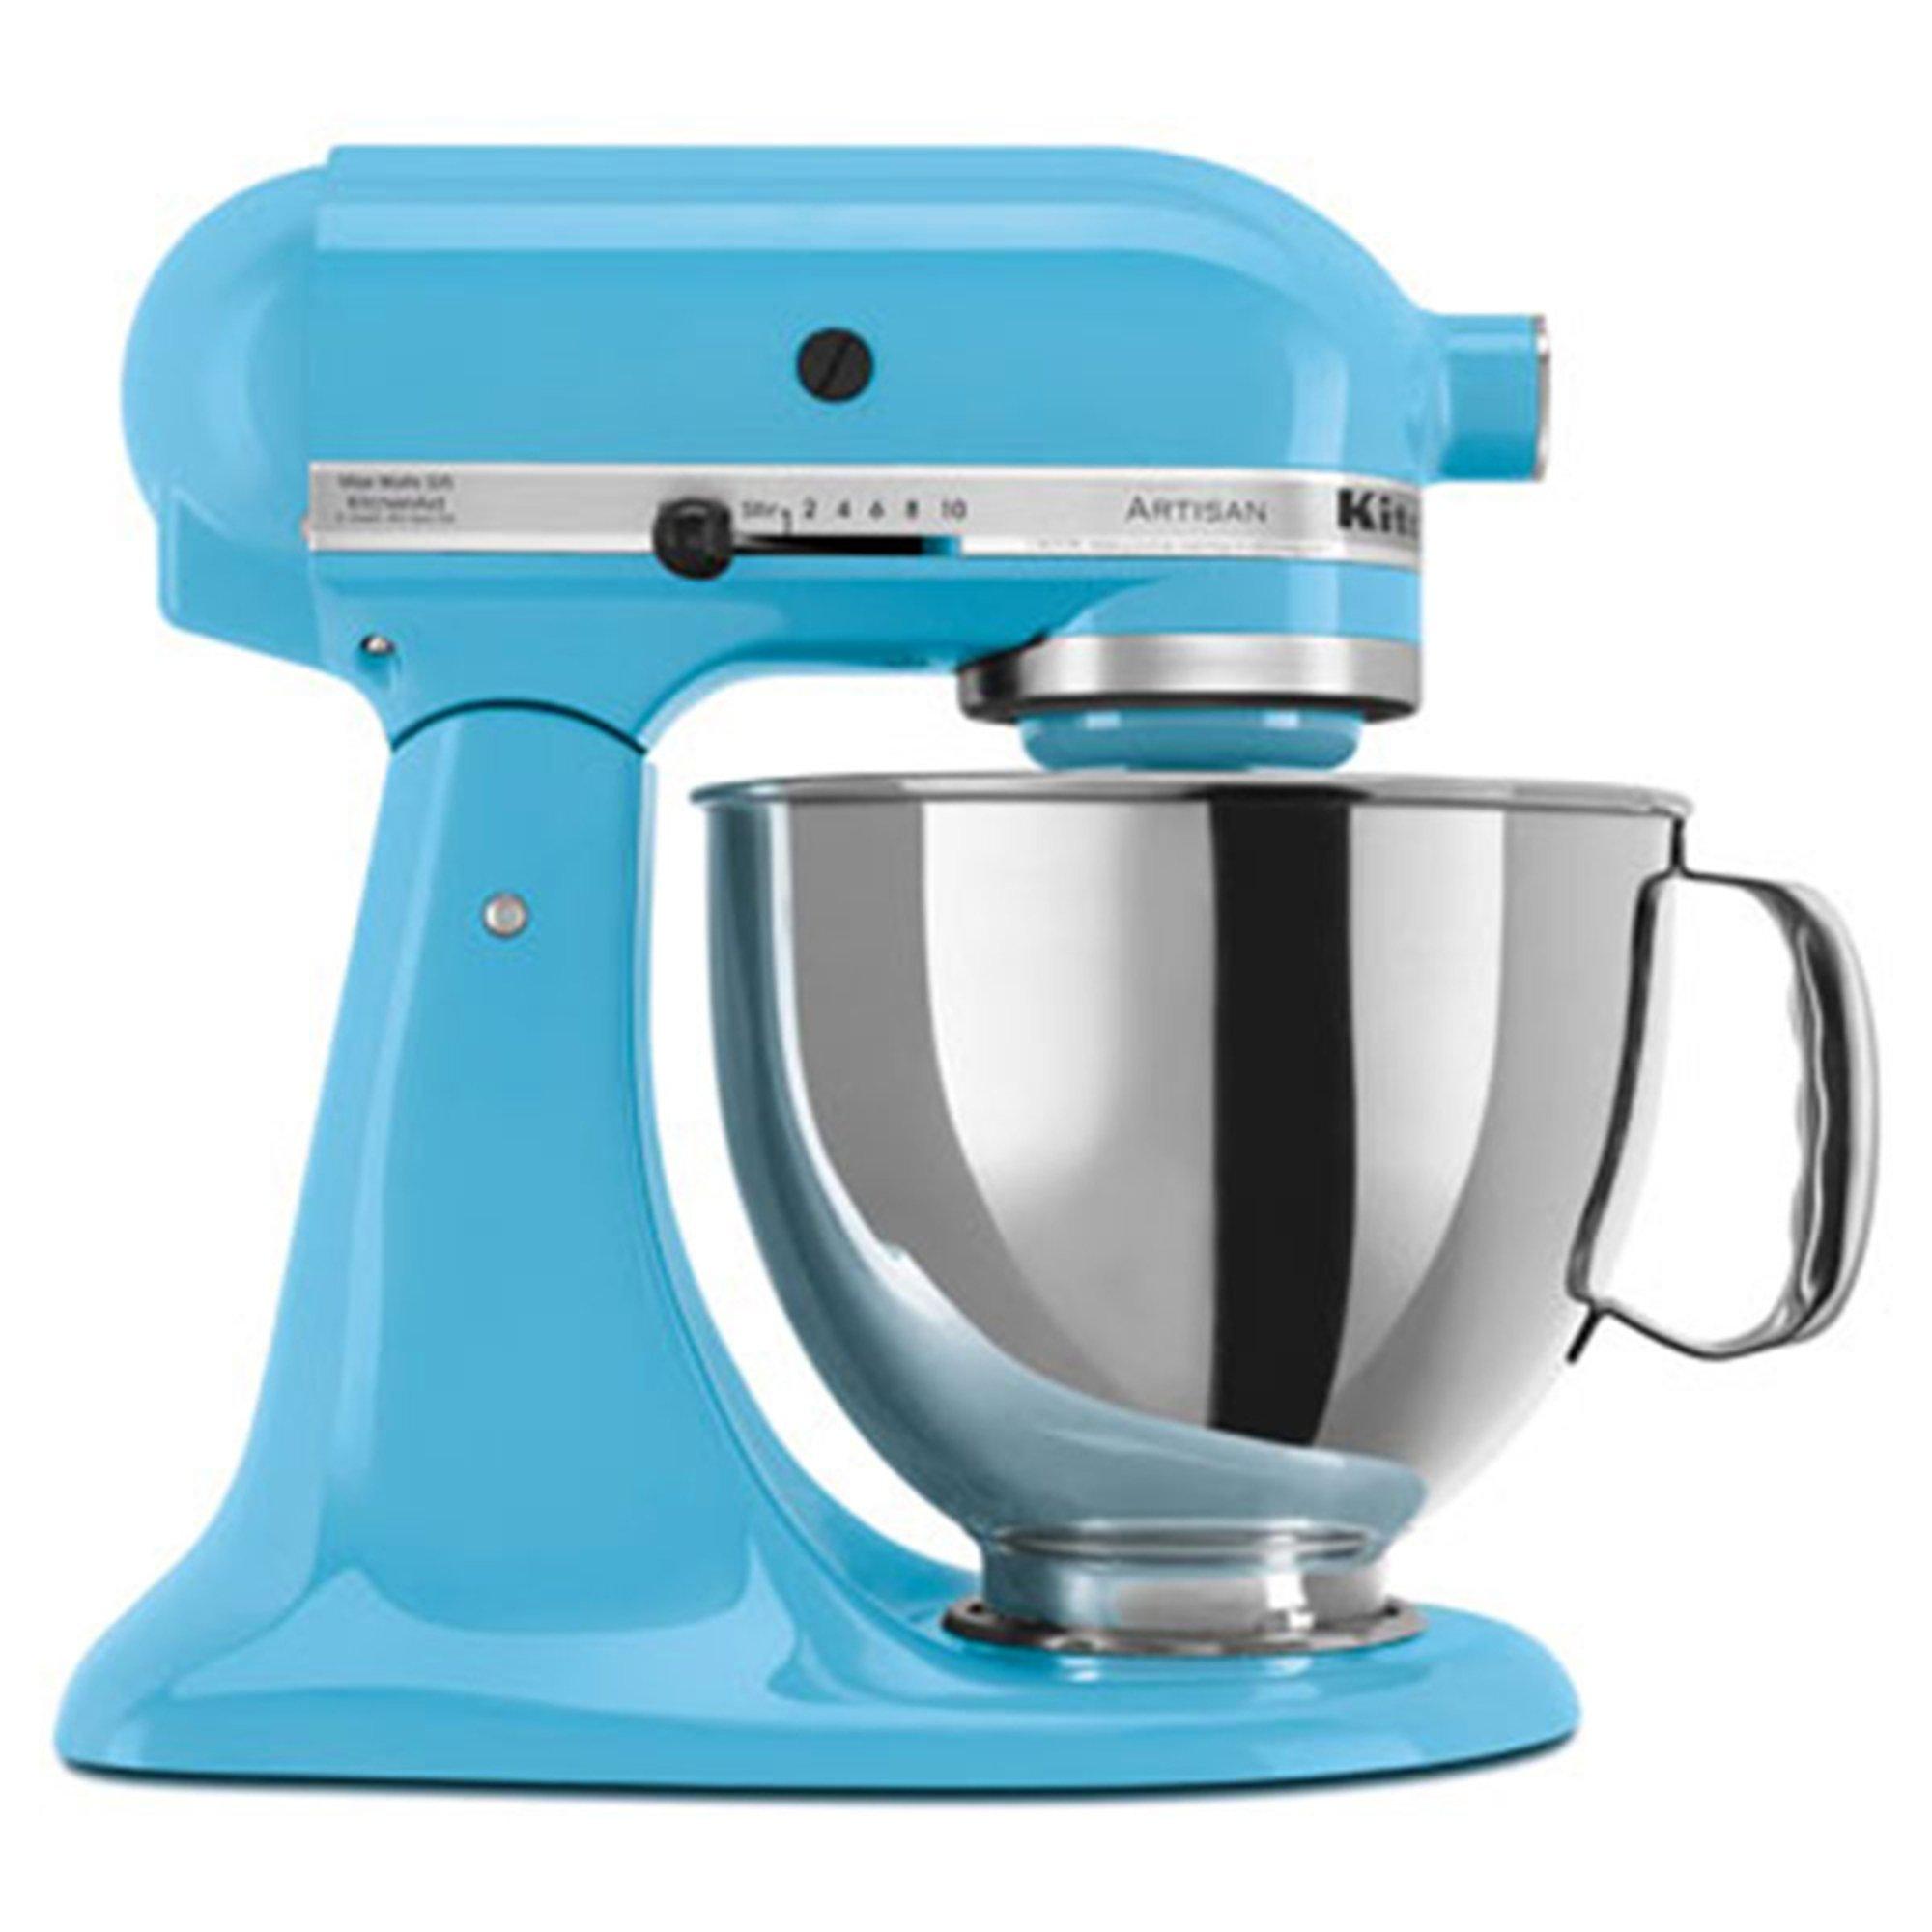 Kitchenaid Artisan Series 5-quart Tilt-head Stand Mixer - Crystal ...